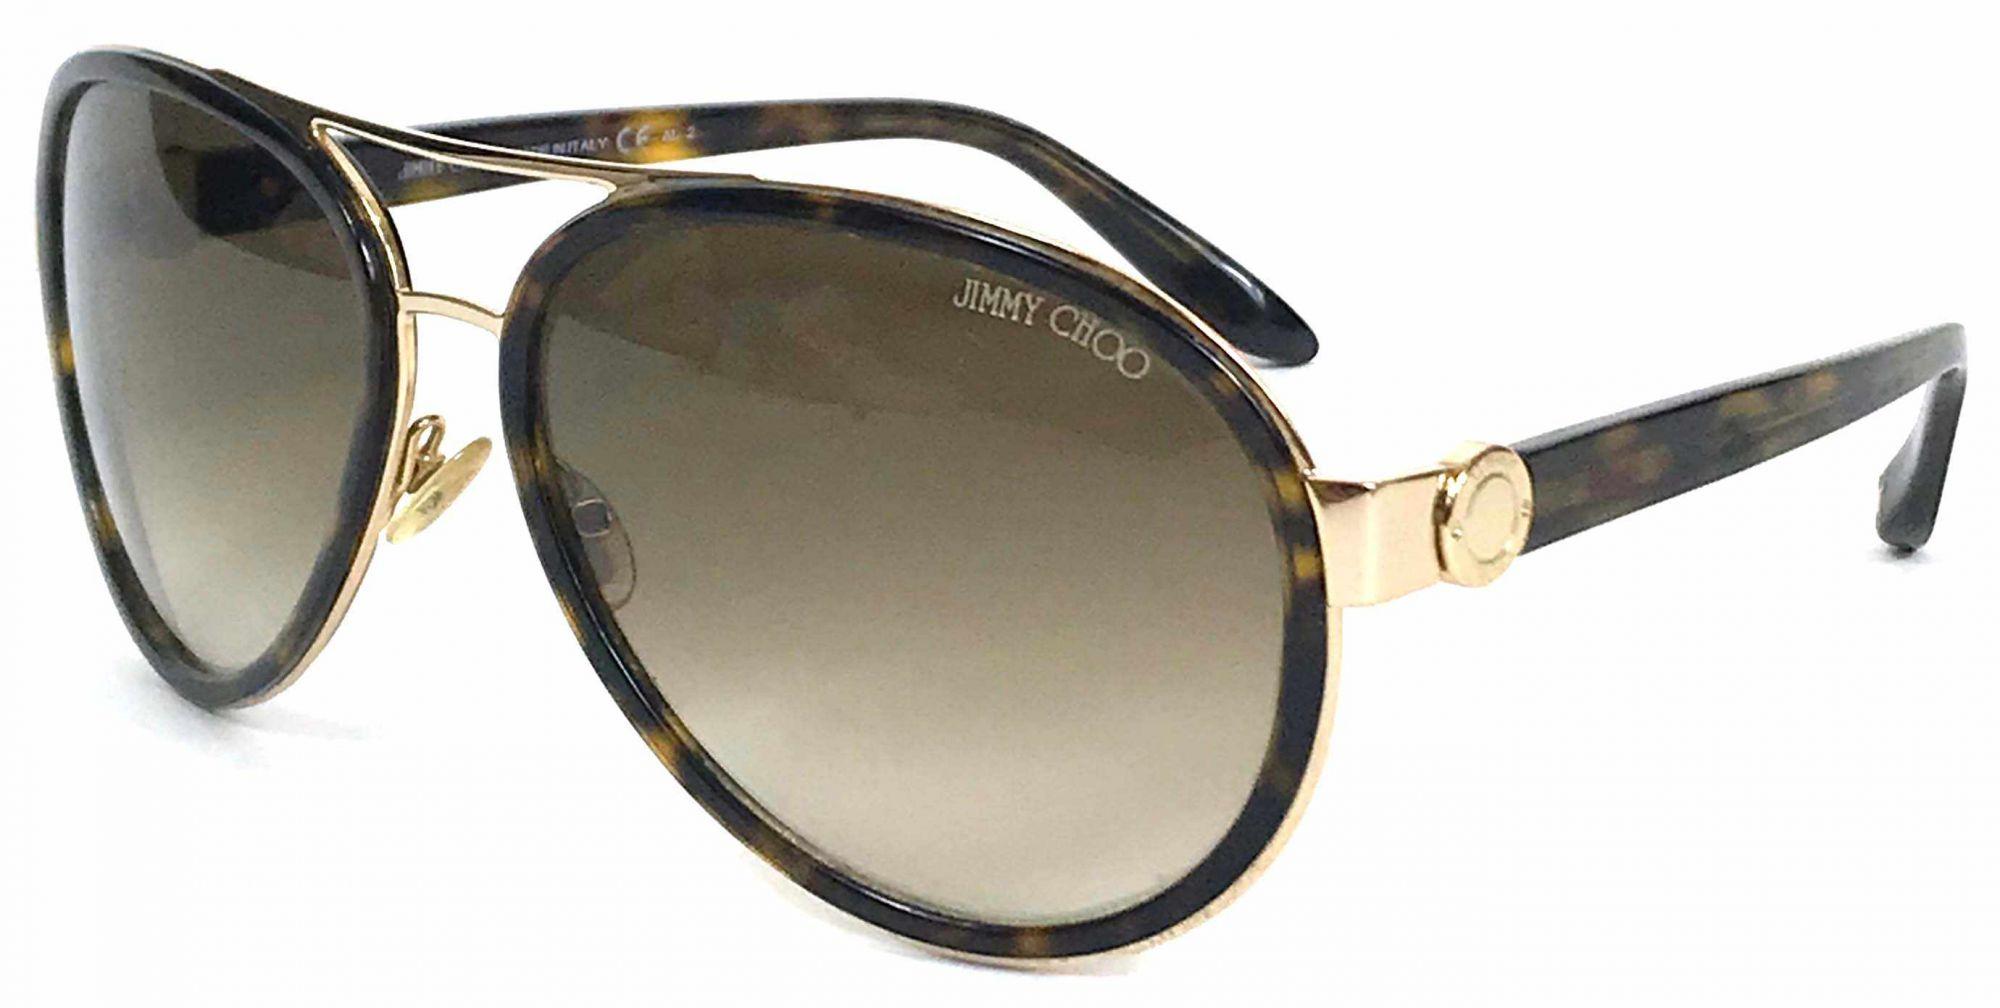 Jimmy Choo Aviator Sunglasses